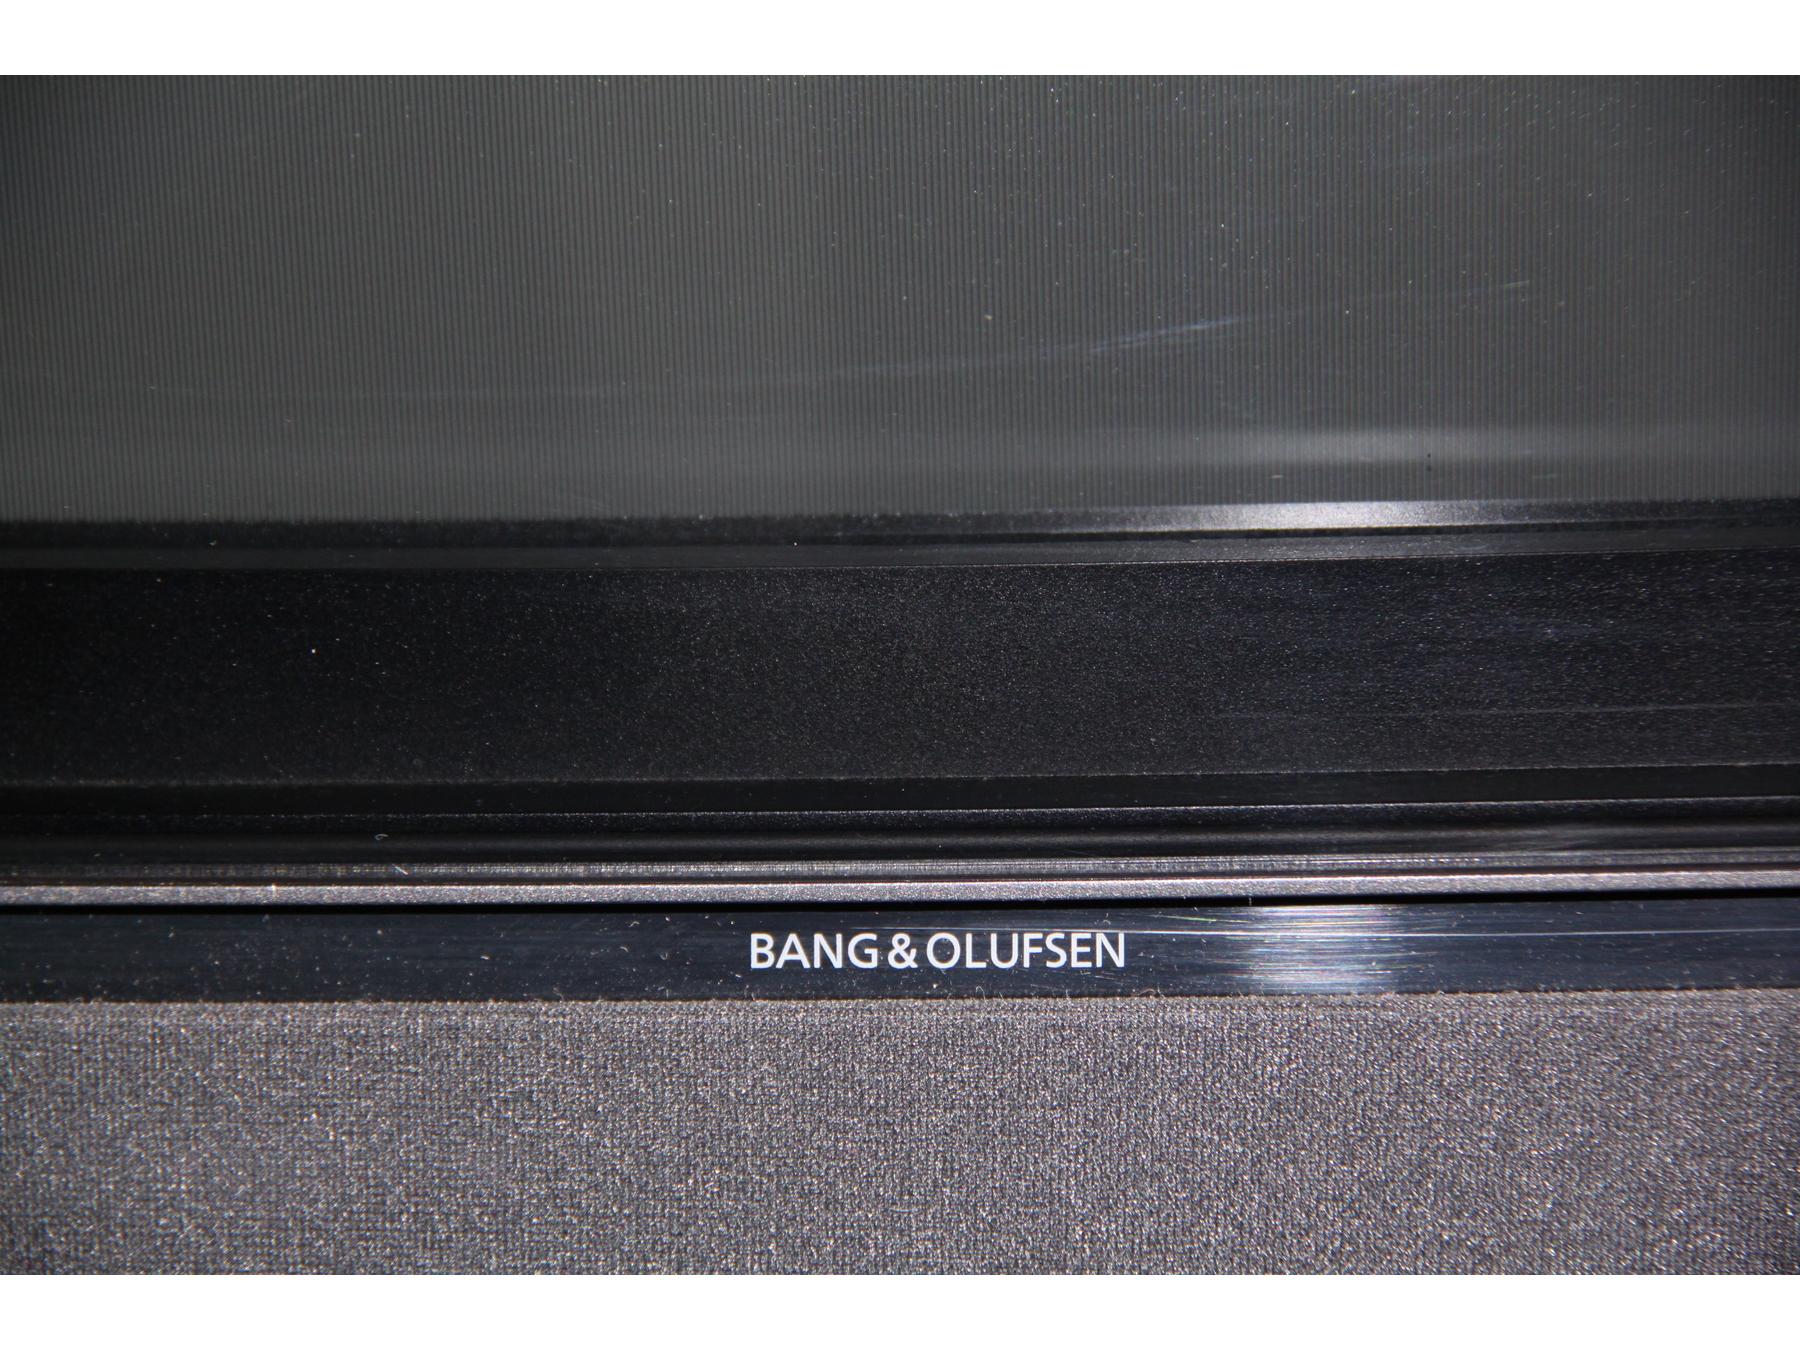 tv bang olufsen mx4002 imp teletext denmark 23602729. Black Bedroom Furniture Sets. Home Design Ideas